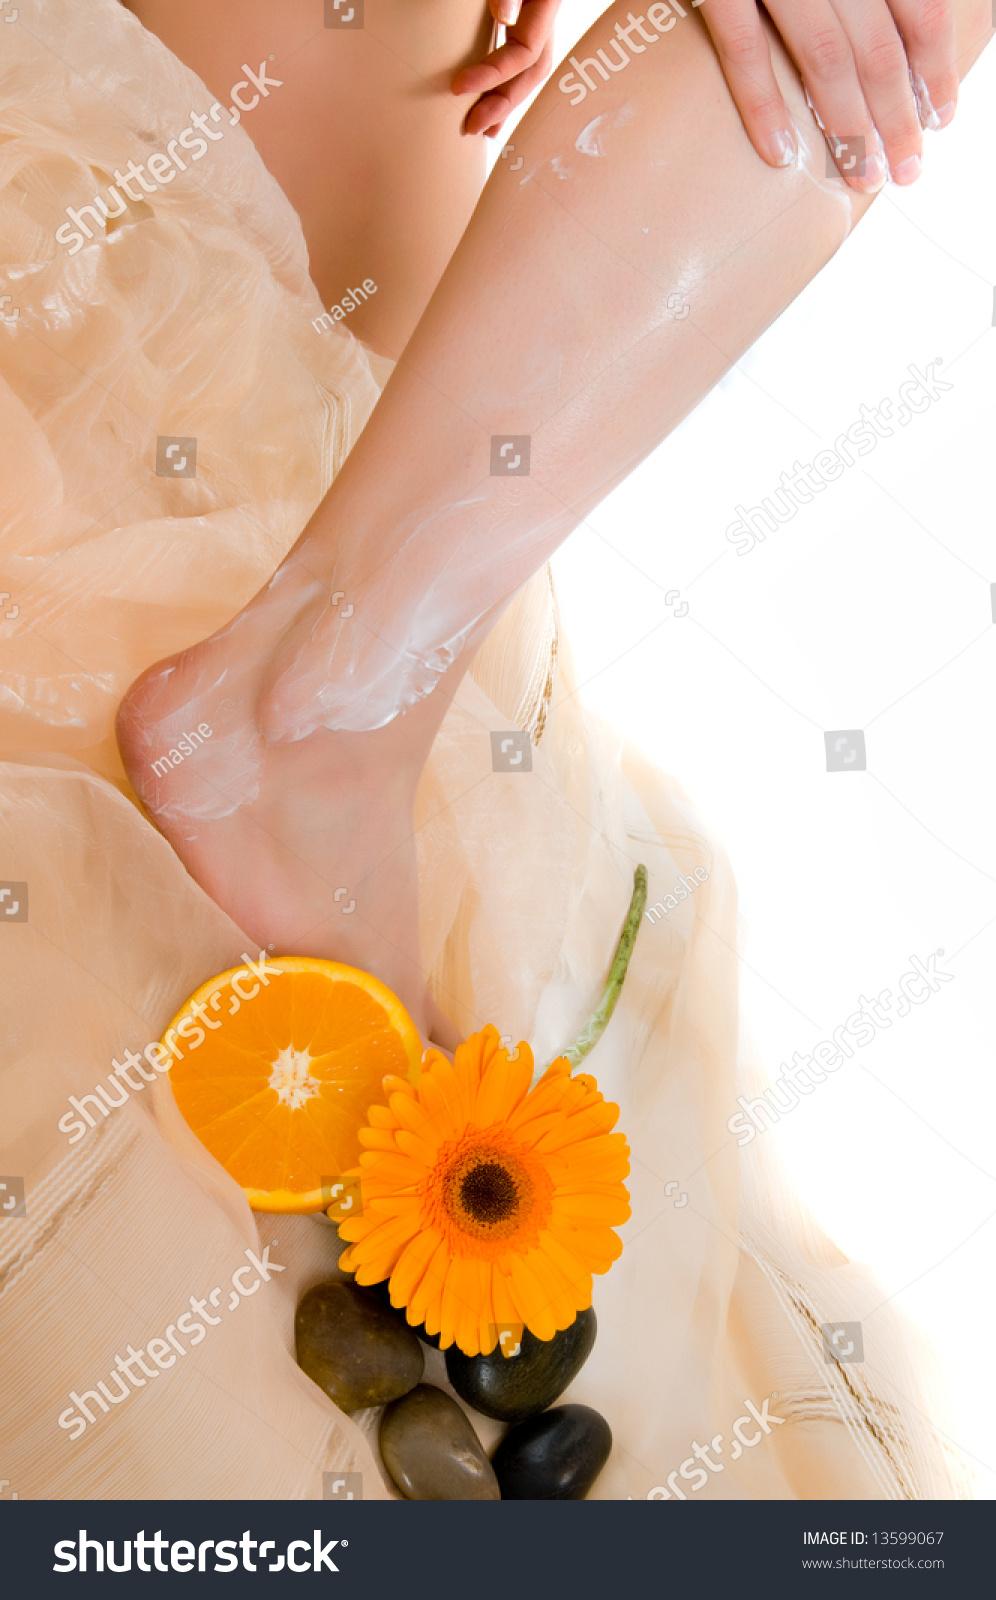 Legs Girl Stock Photo 13599067